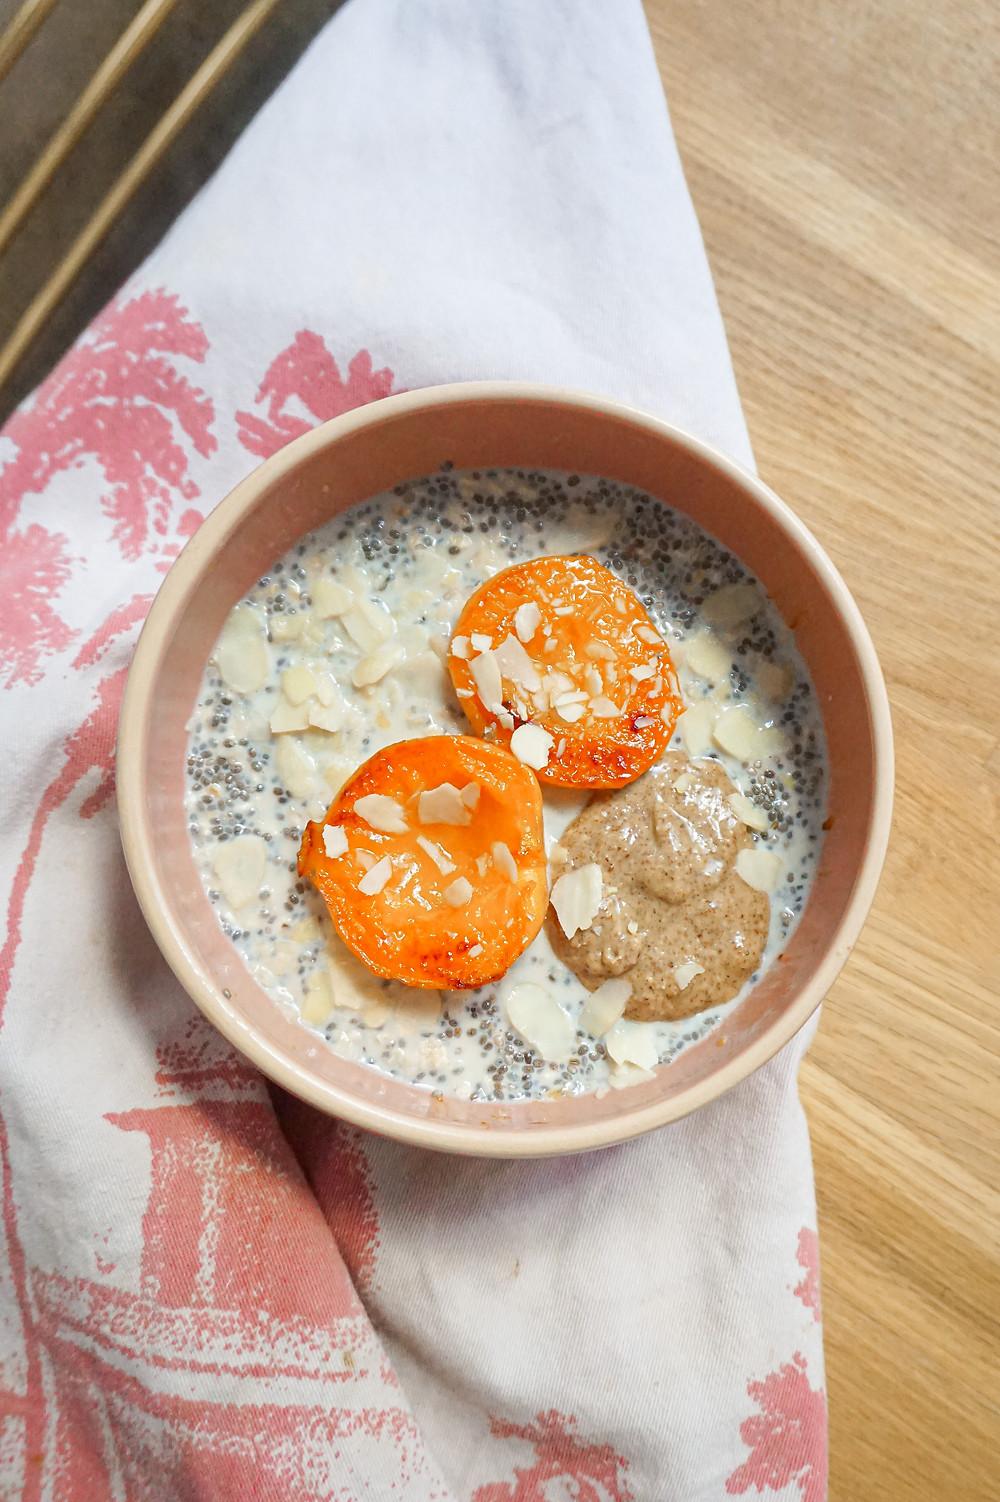 Mon porridge froid à l'abricot rôti